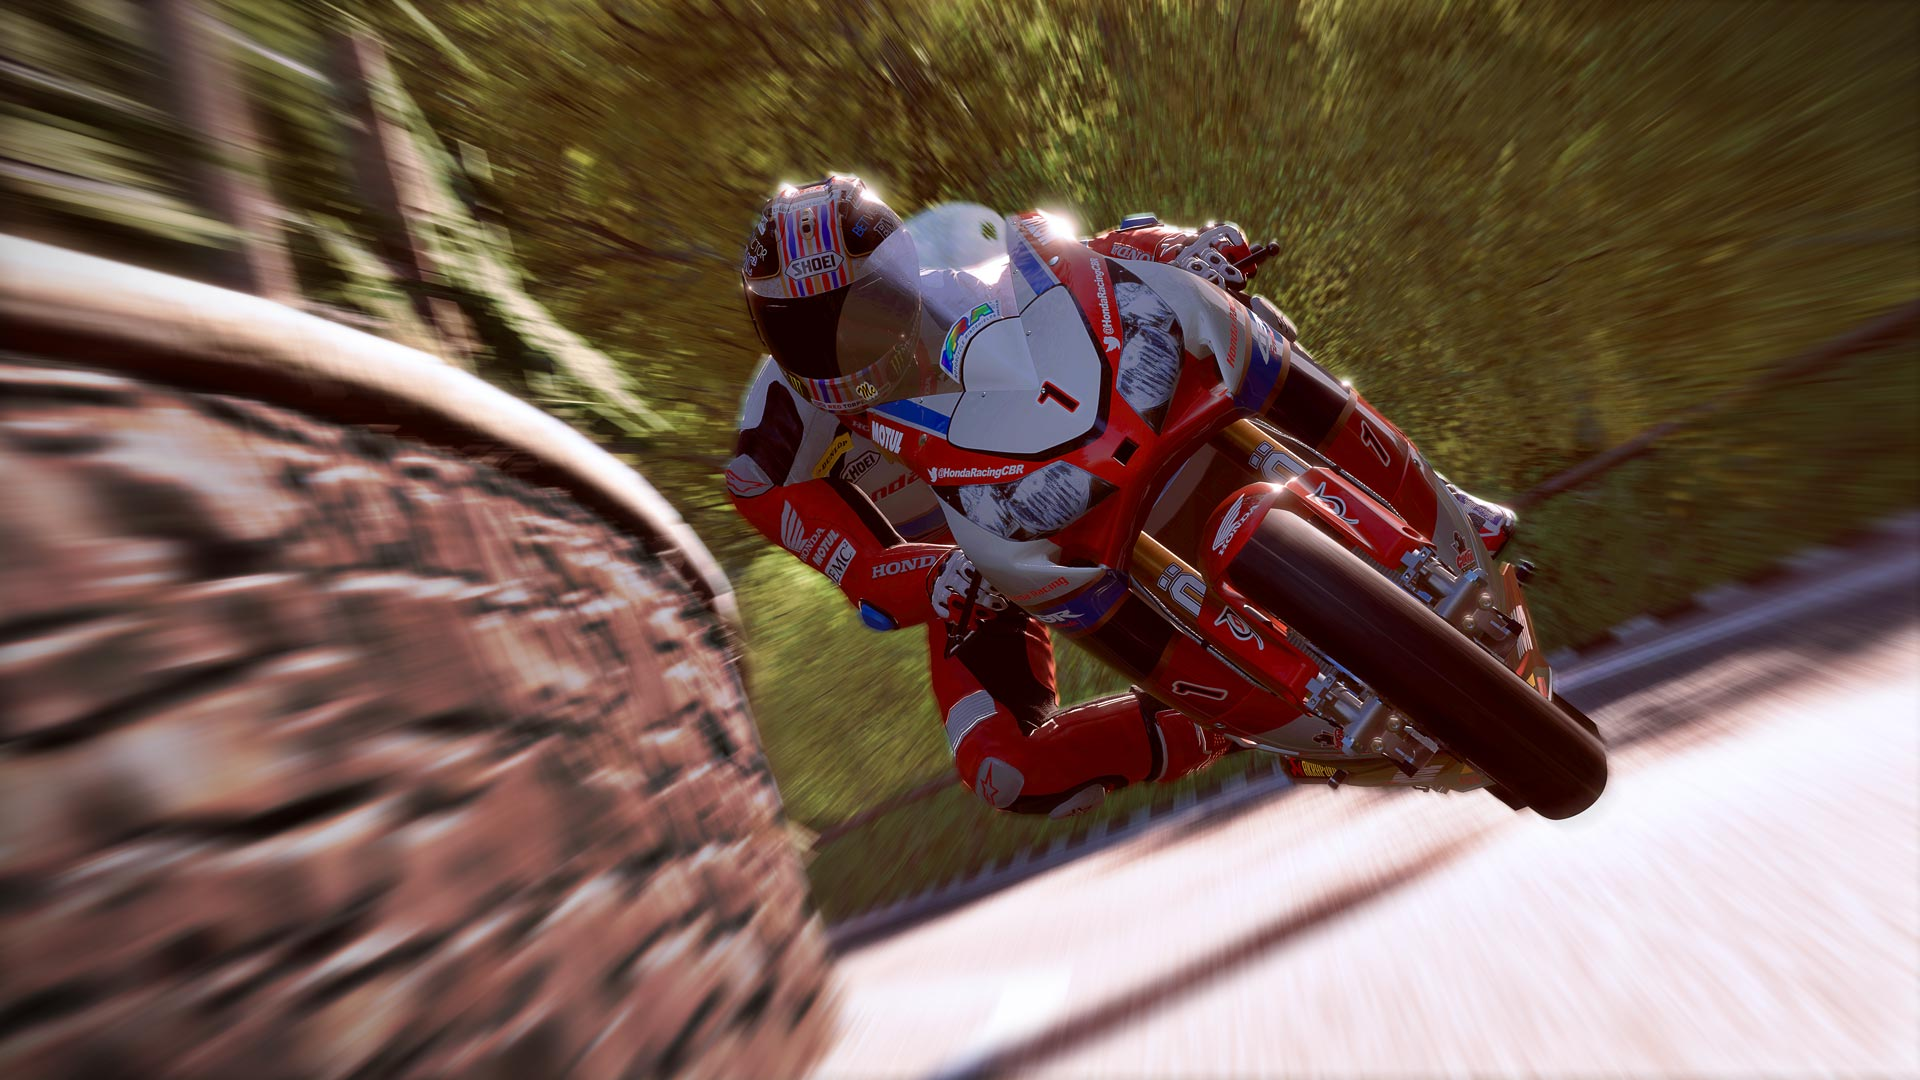 TT Isle of Man Steam image 1